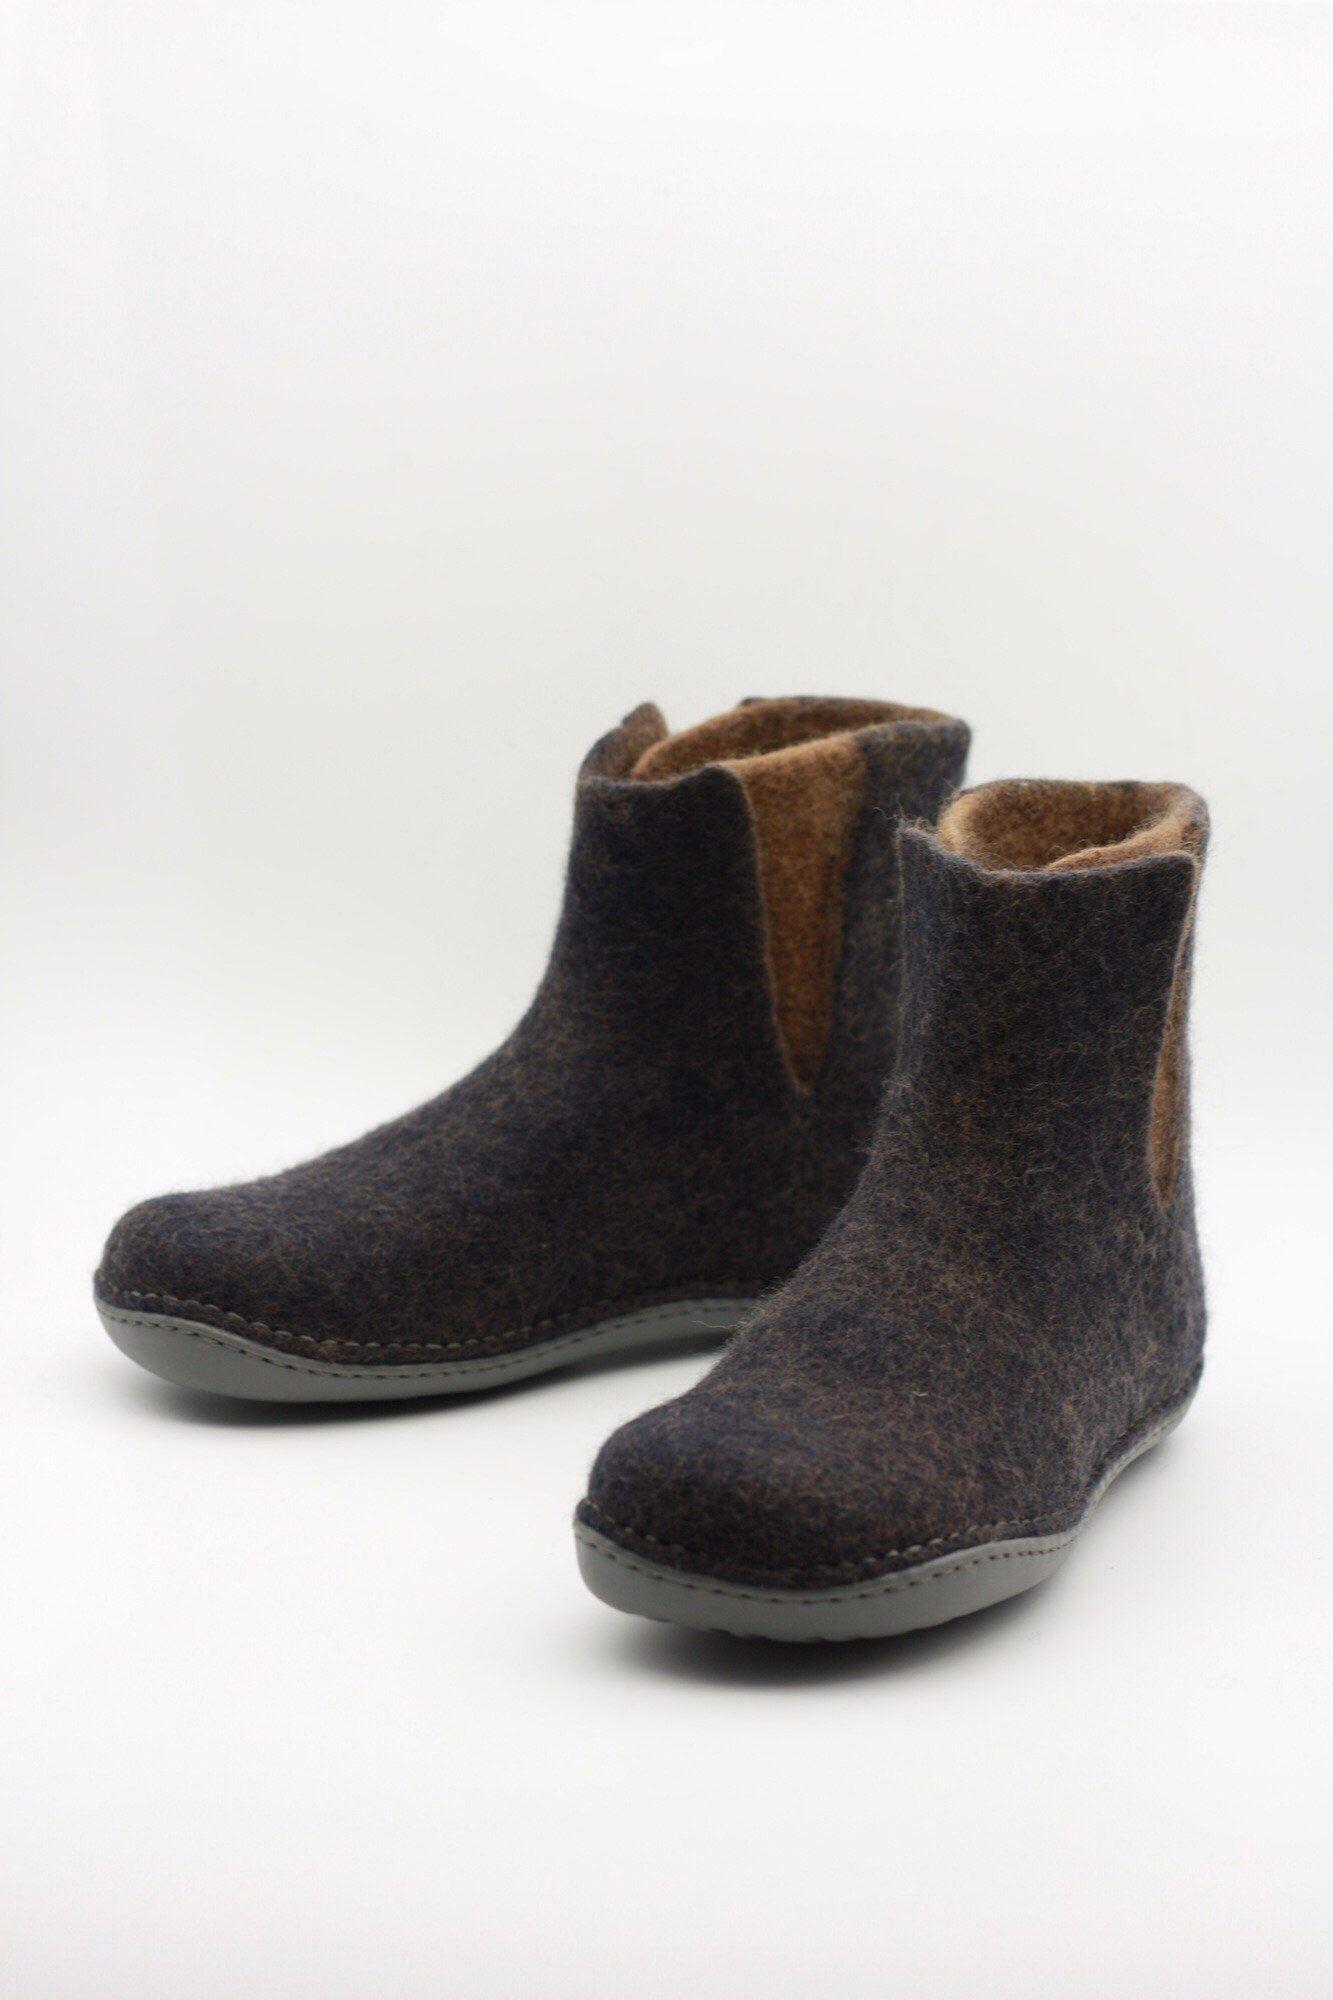 89be4a164eb94 LUCIELALUNE / chelsea boots / men women /handmade felted merino wool ...